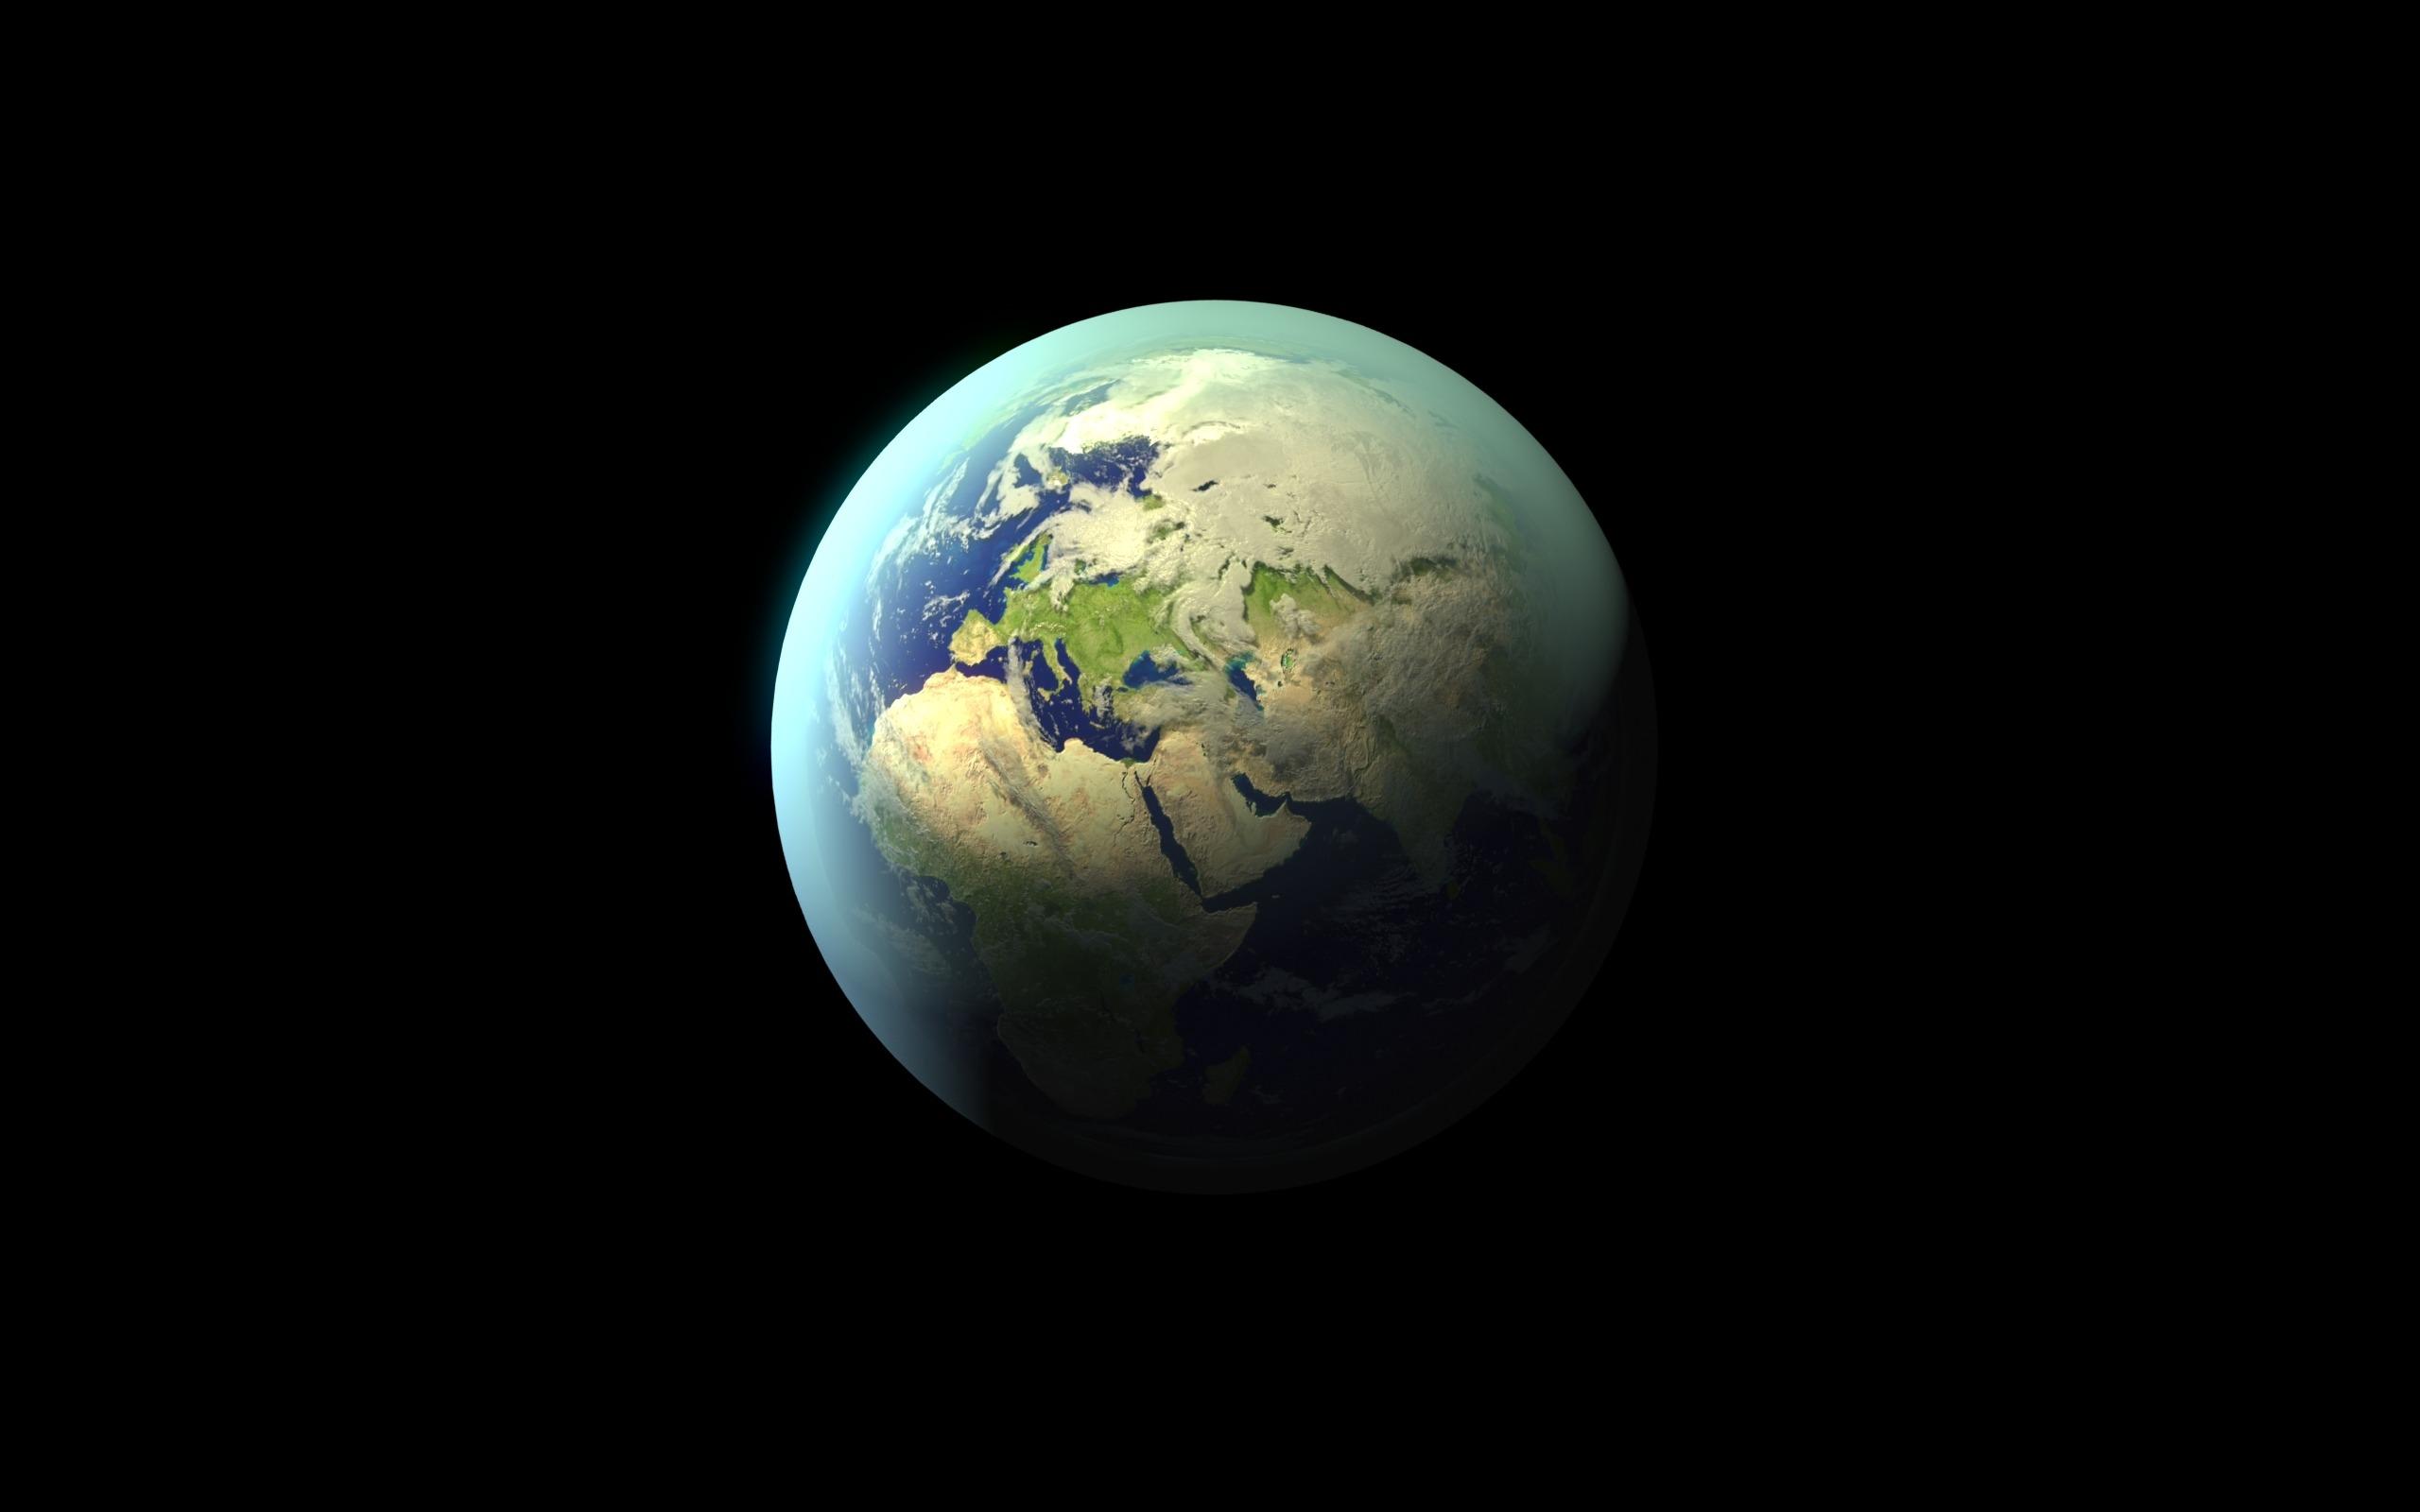 planets surrounding earth - HD1920×1200